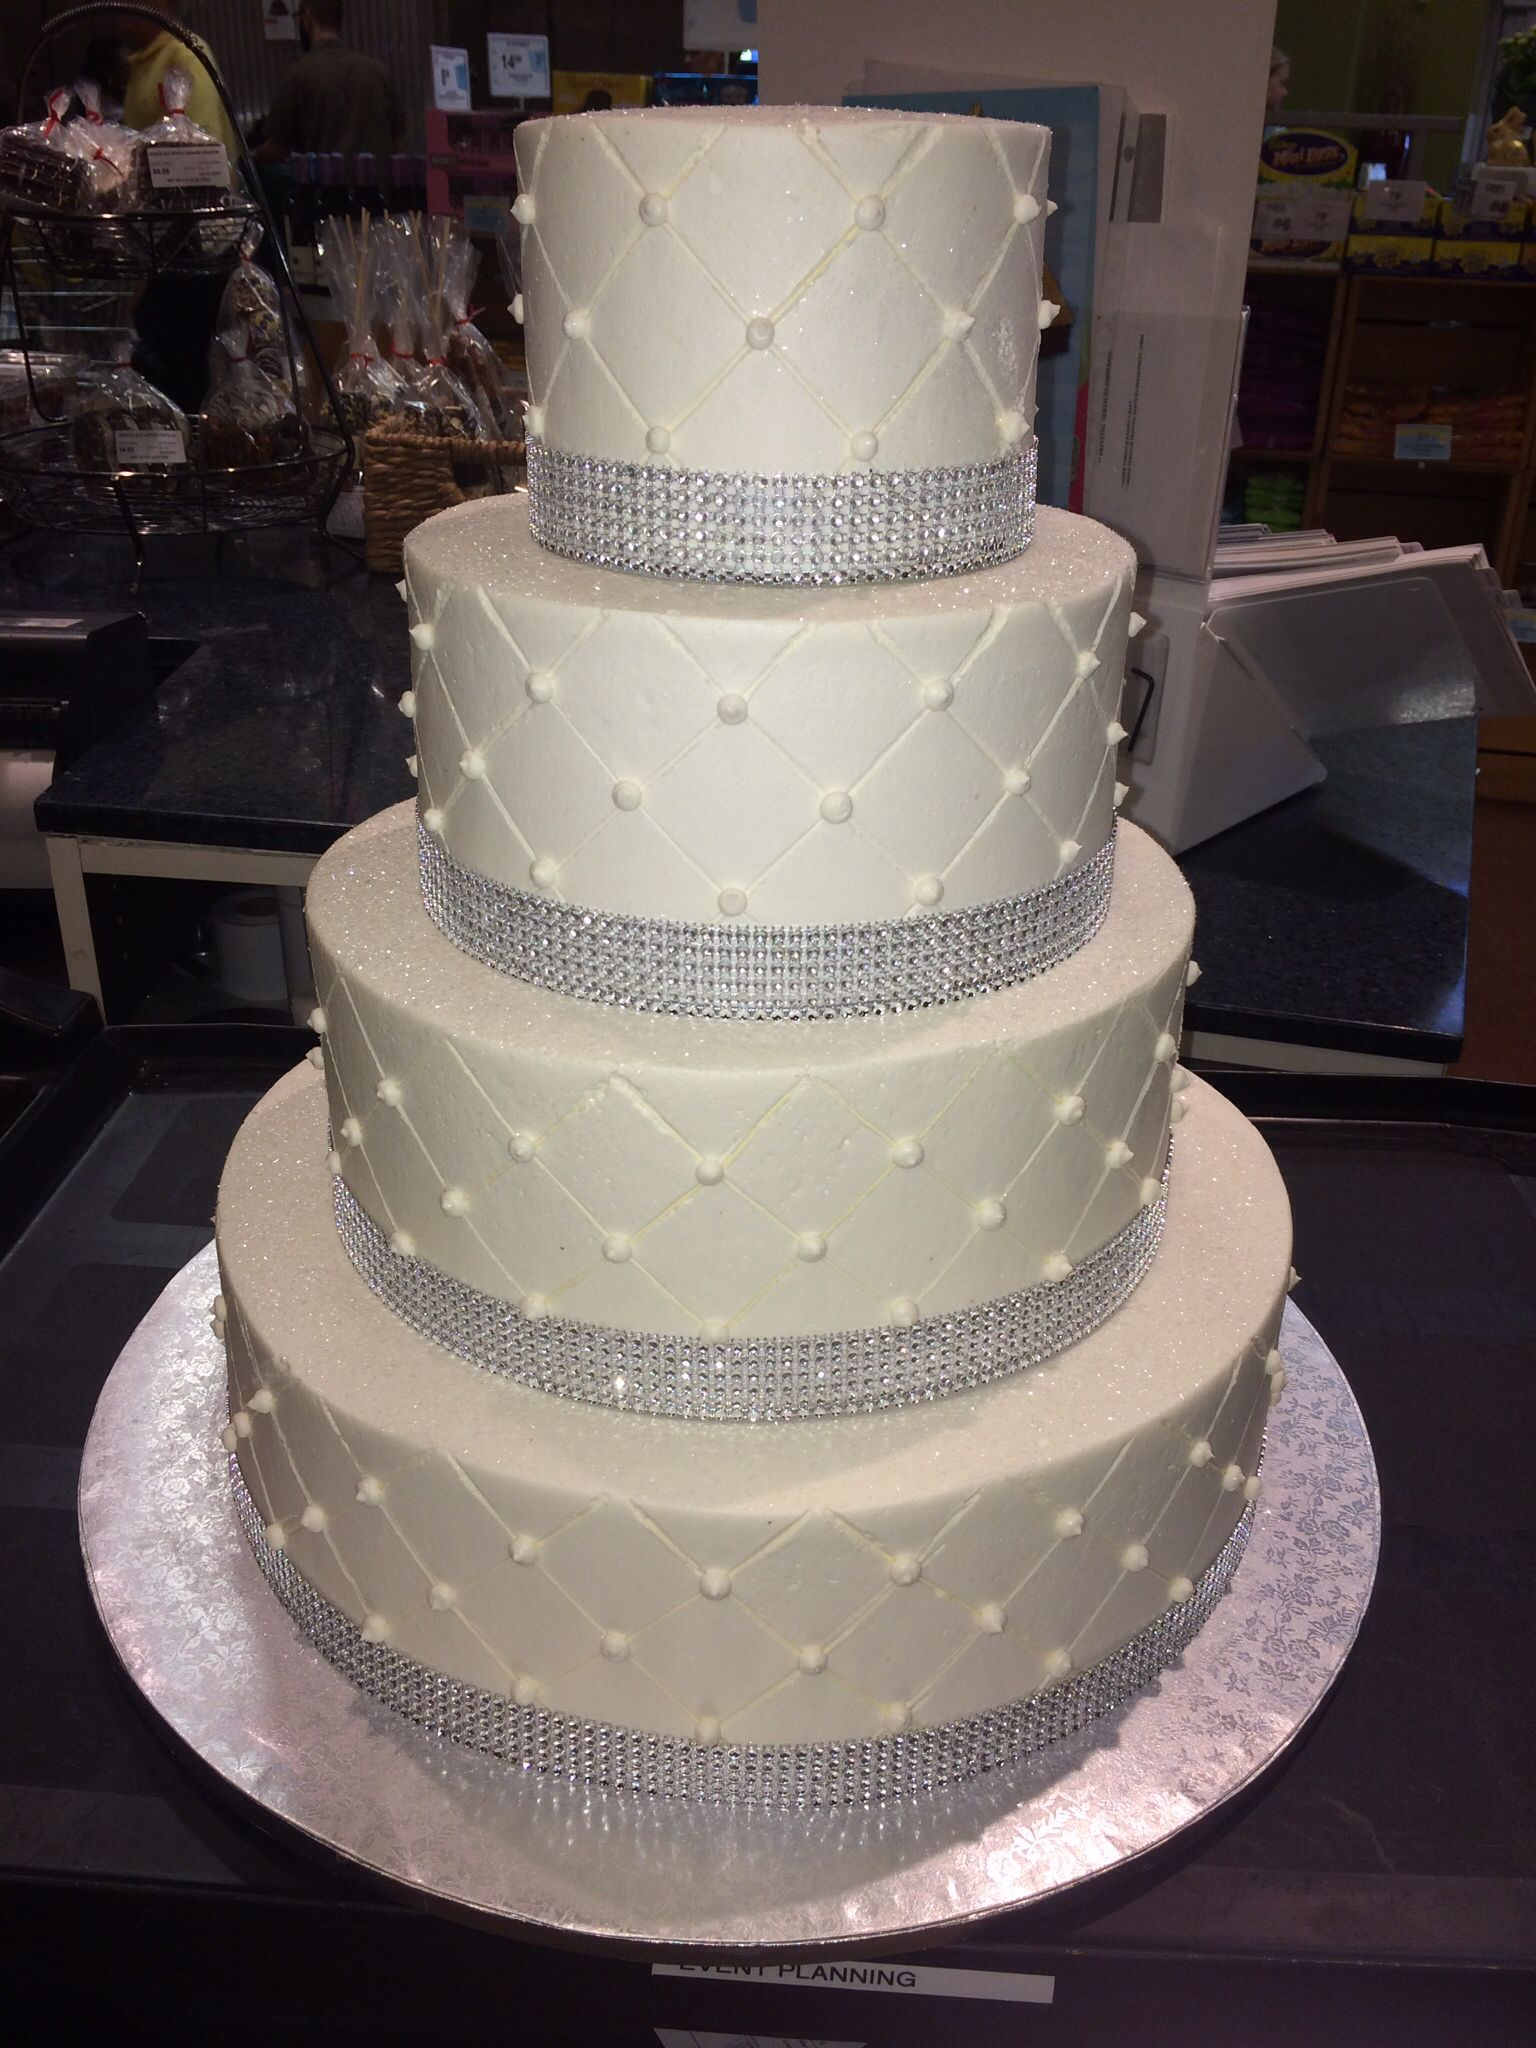 Publix GreenWise Wedding Cake Hyde Park Tampa FL